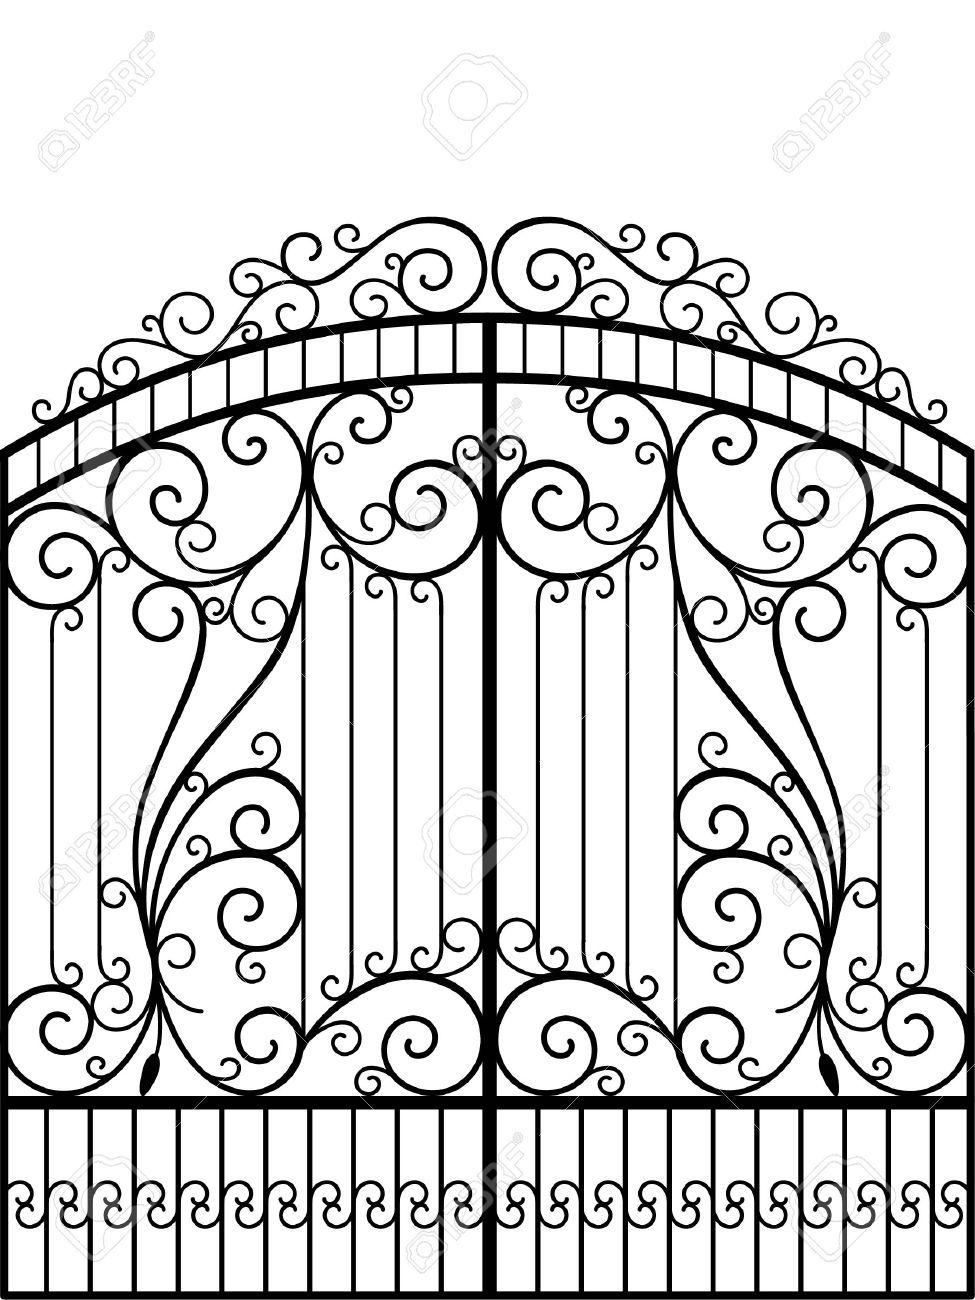 Puerta de hierro forjado, puerta, valla | Hierro forjado | Pinterest ...